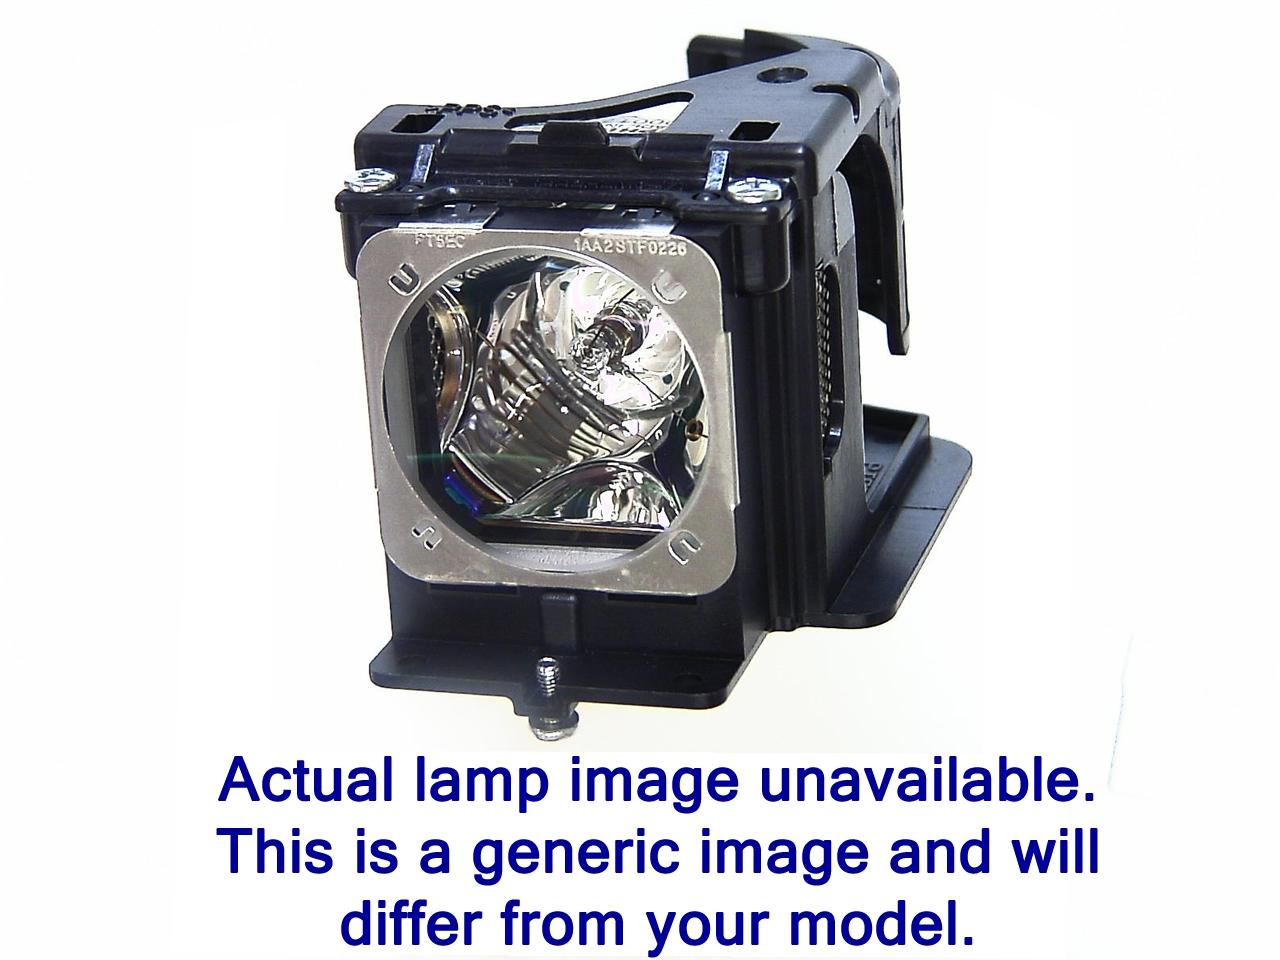 Diamond Lámpara For BOXLIGHT CP-775i Proyector.